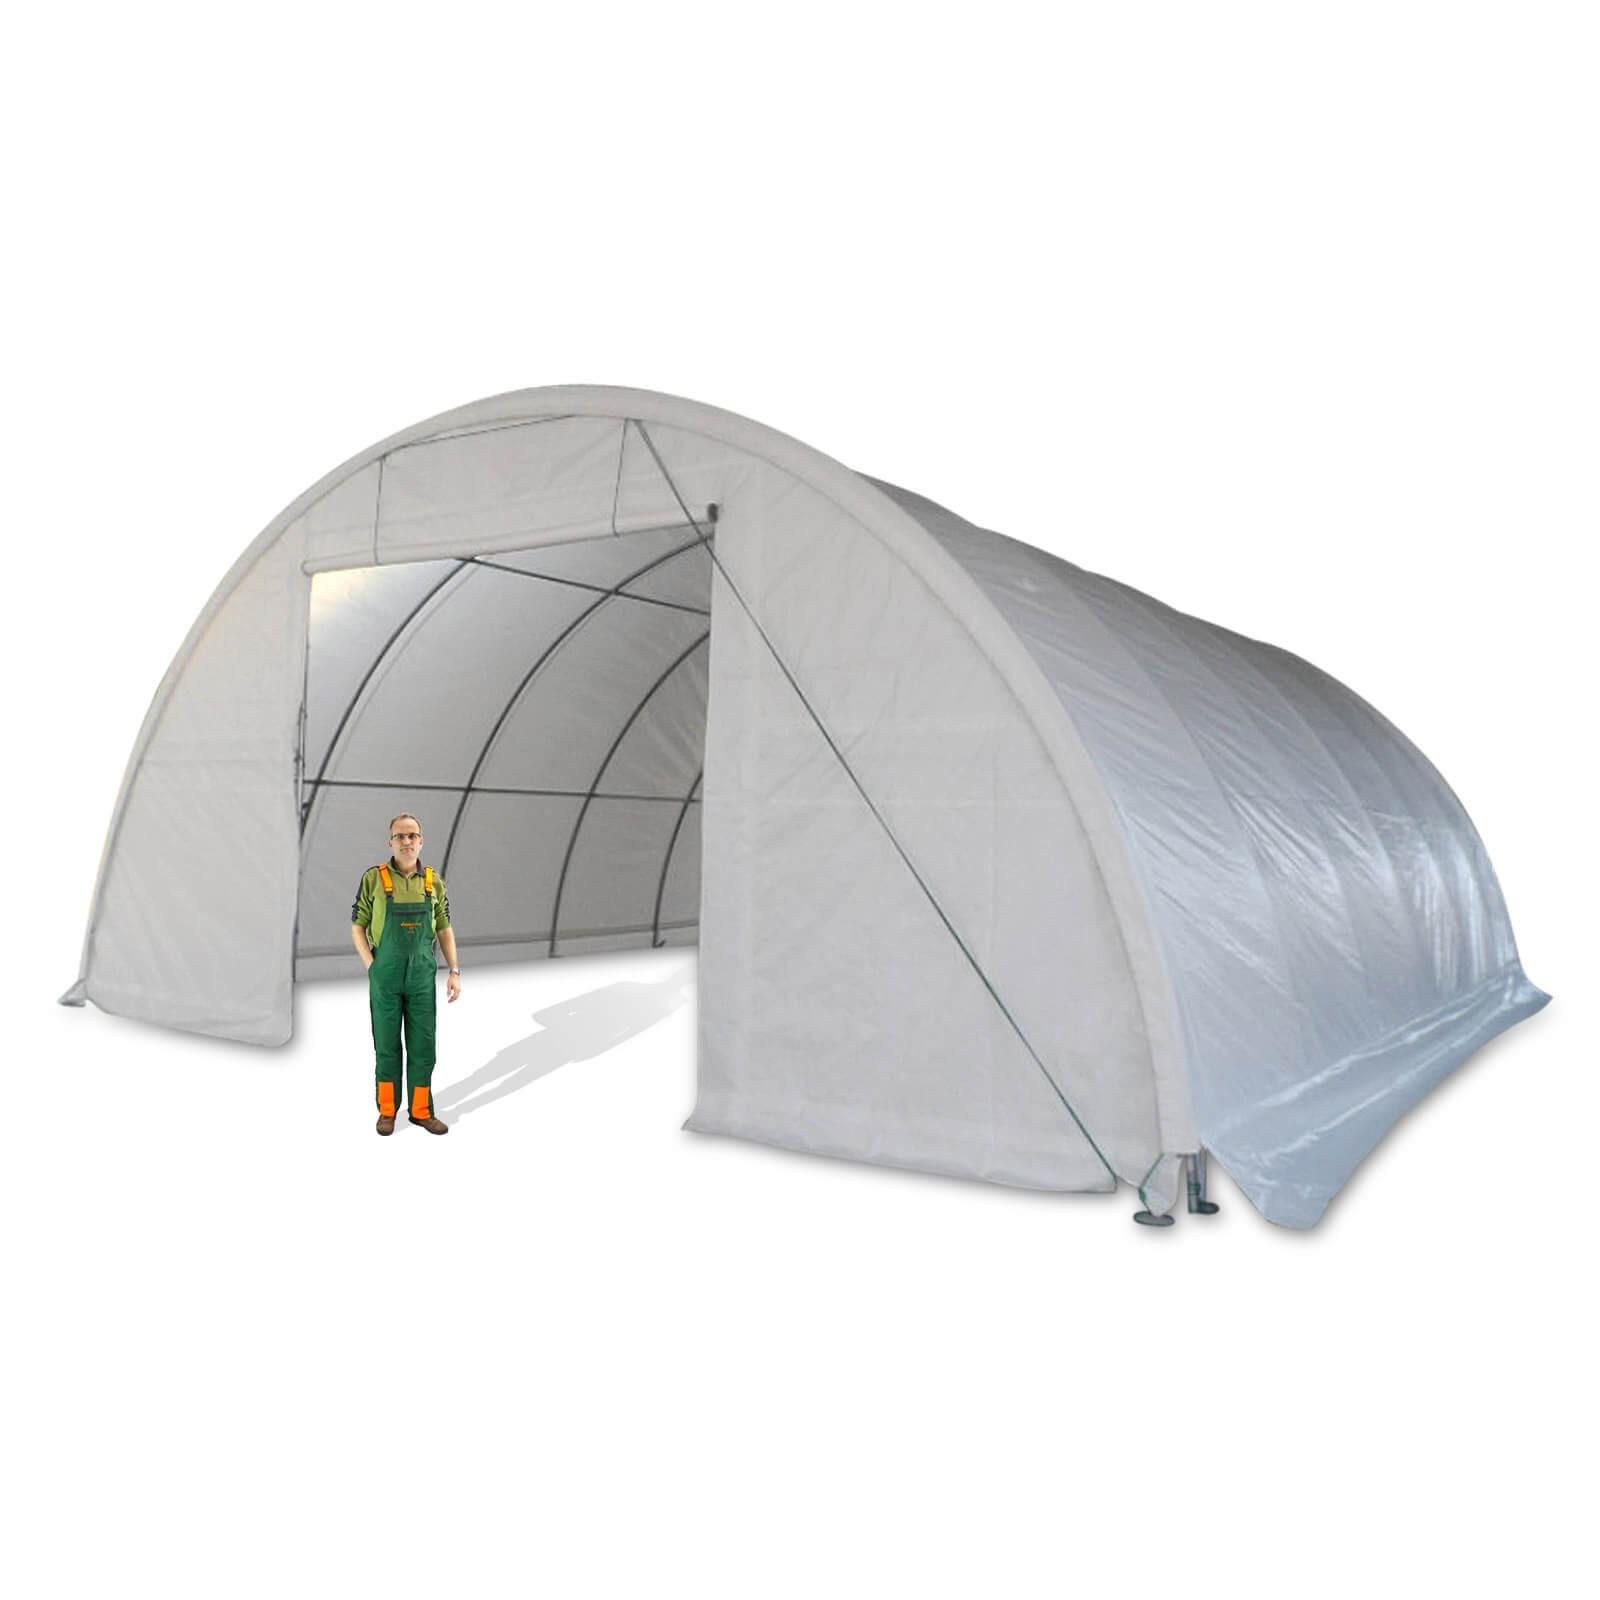 Dema Lagerzelt Glasgow Pro 12x9,15 m Materialzelt Zeltgarage Weidezelt Lagerhalle 14265